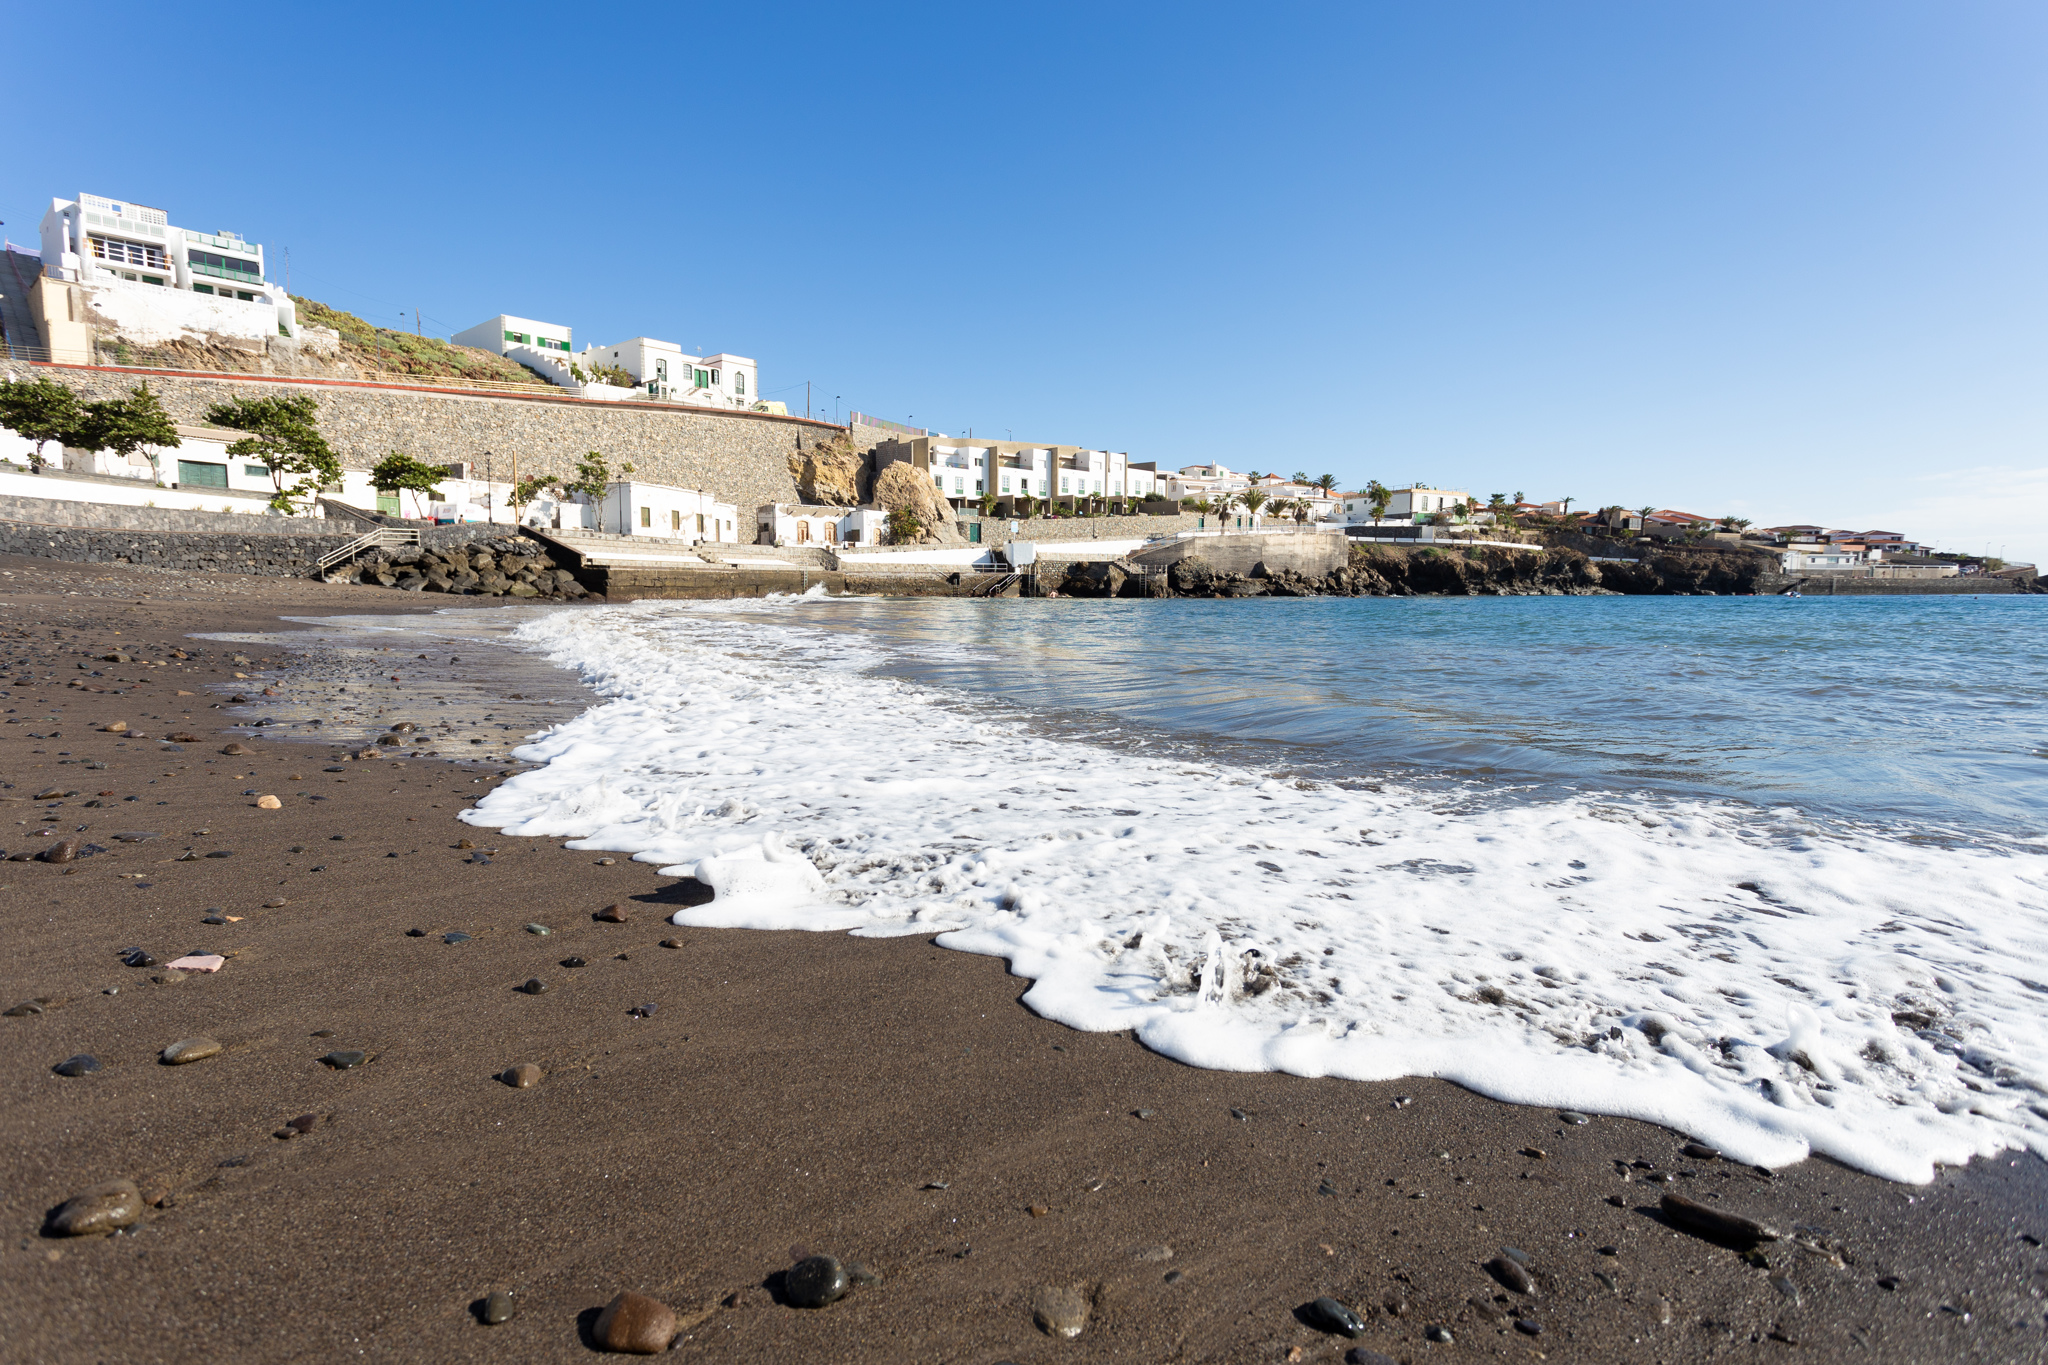 Holiday house direkt am Meer mit eigenem Pool (1671160), Poris de Abona, Tenerife, Canary Islands, Spain, picture 49